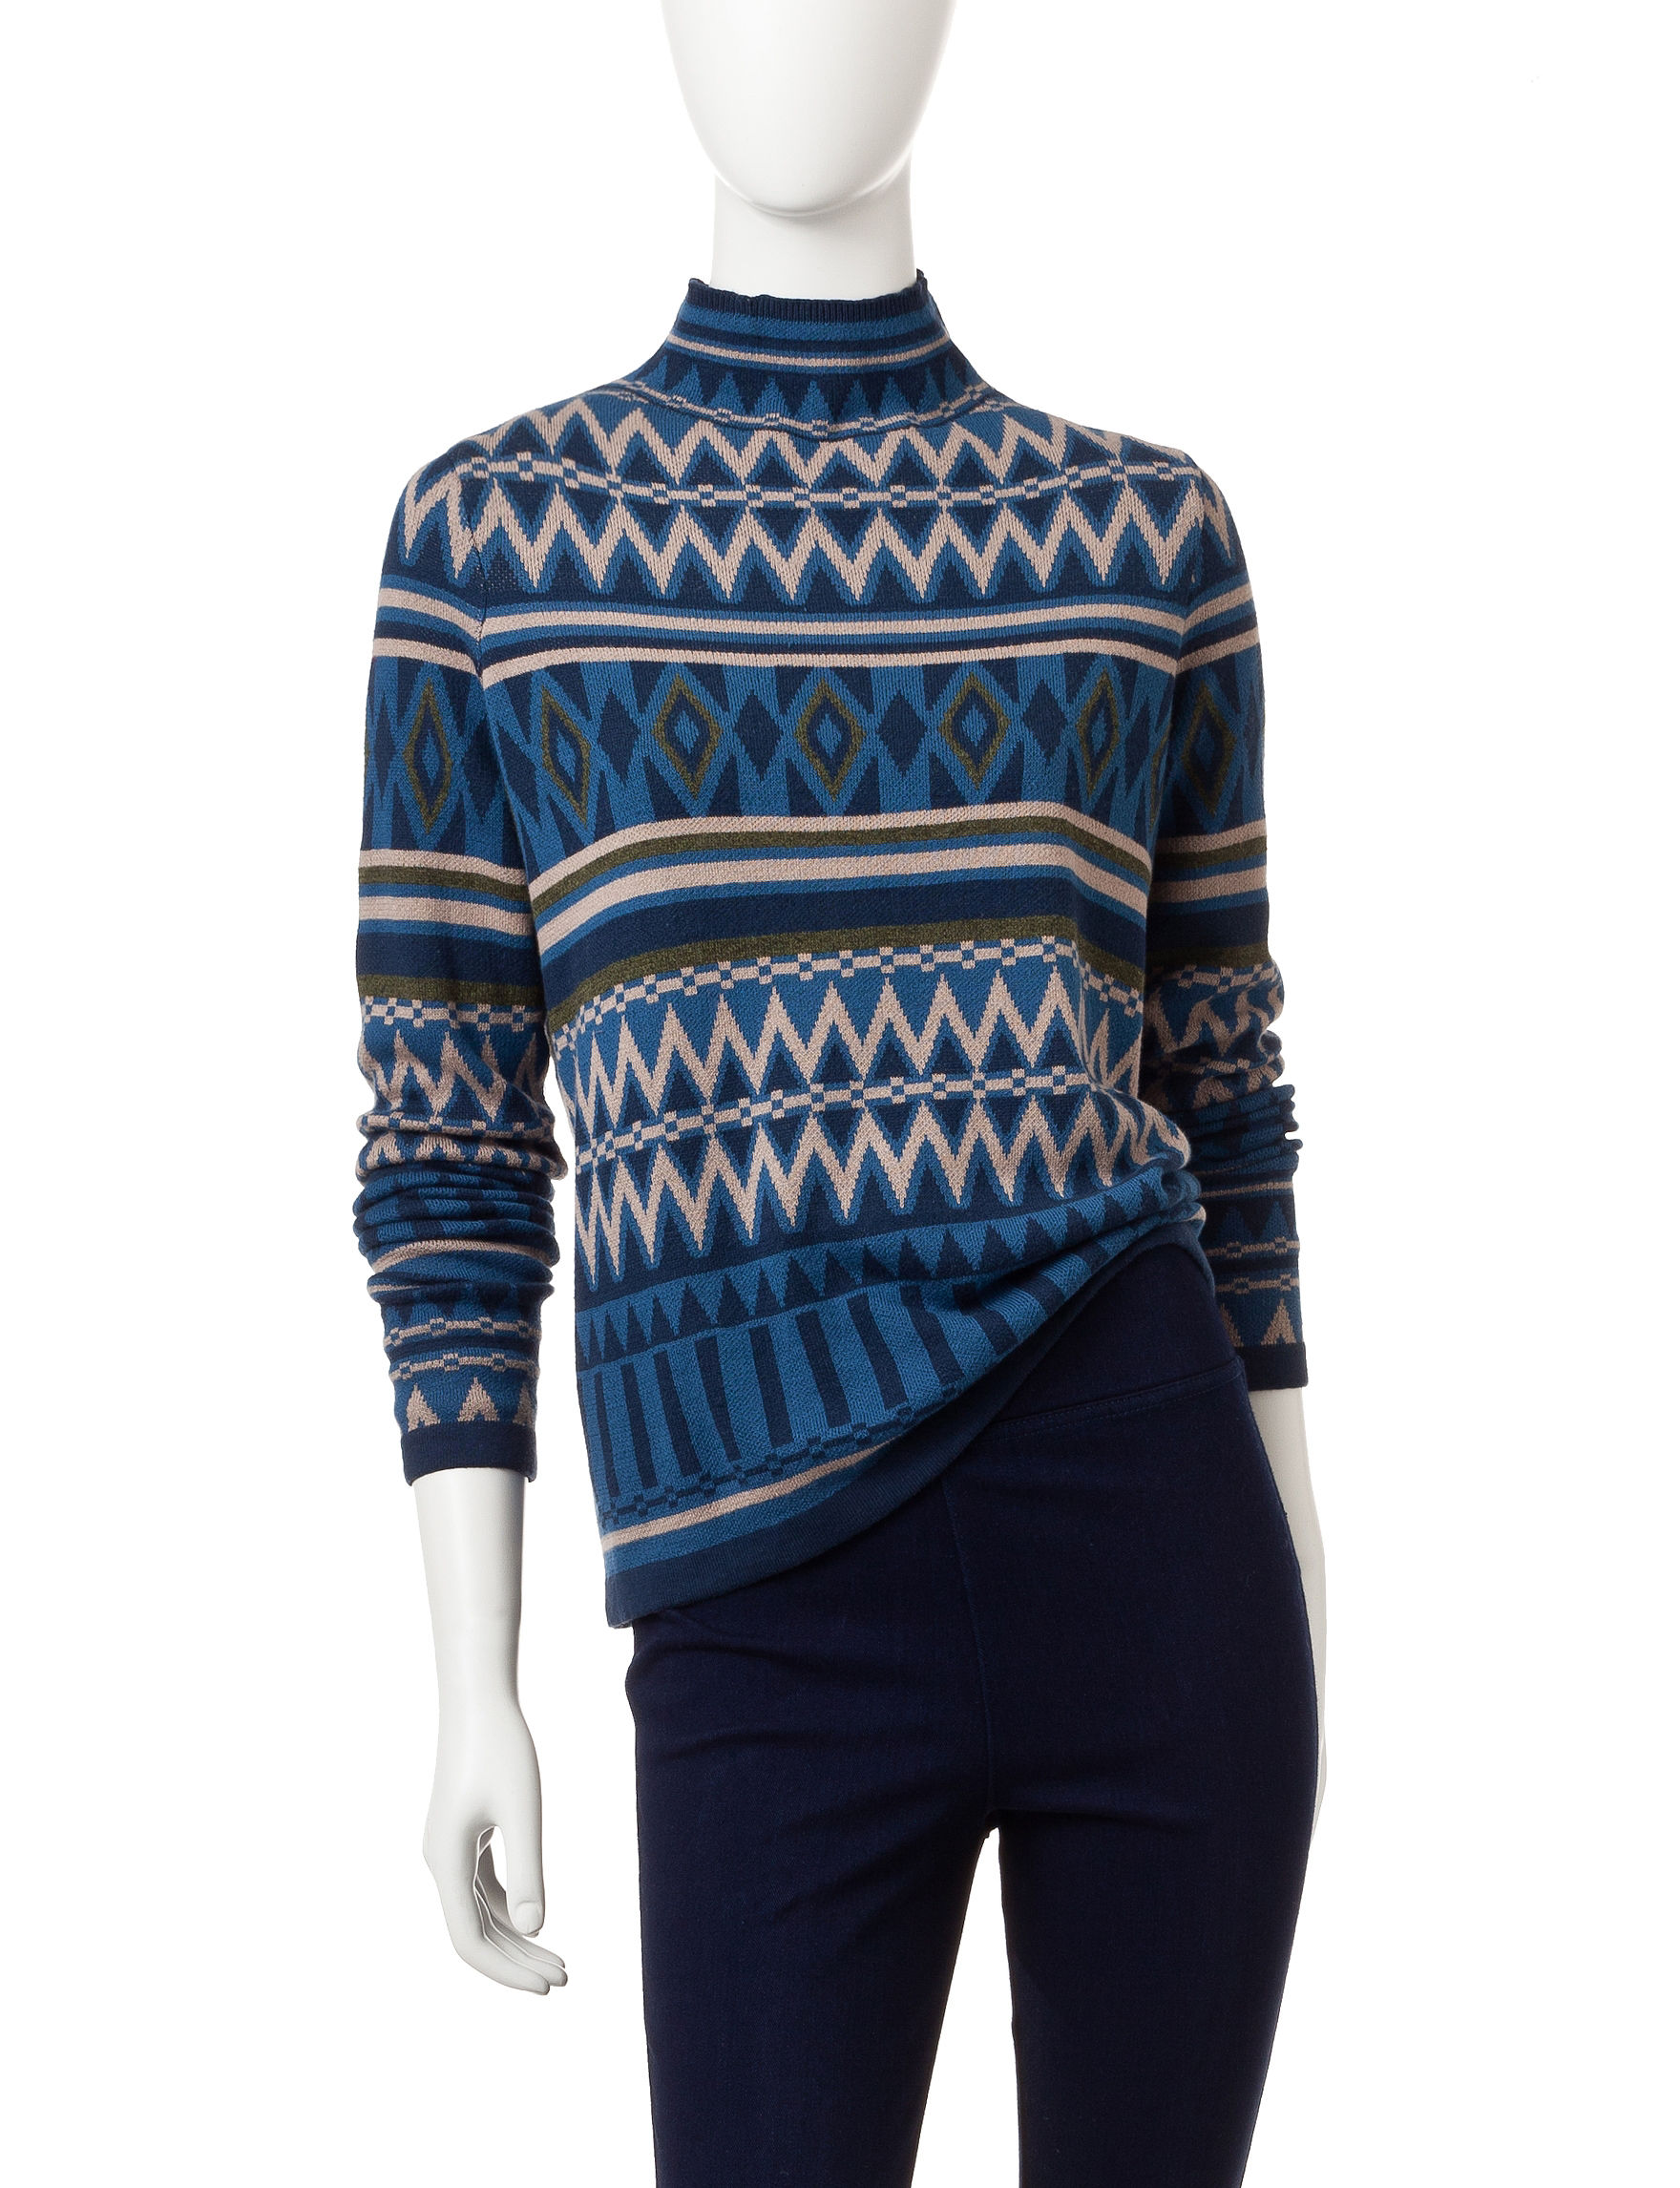 Romeo + Juliet Couture Blue Multi Sweaters